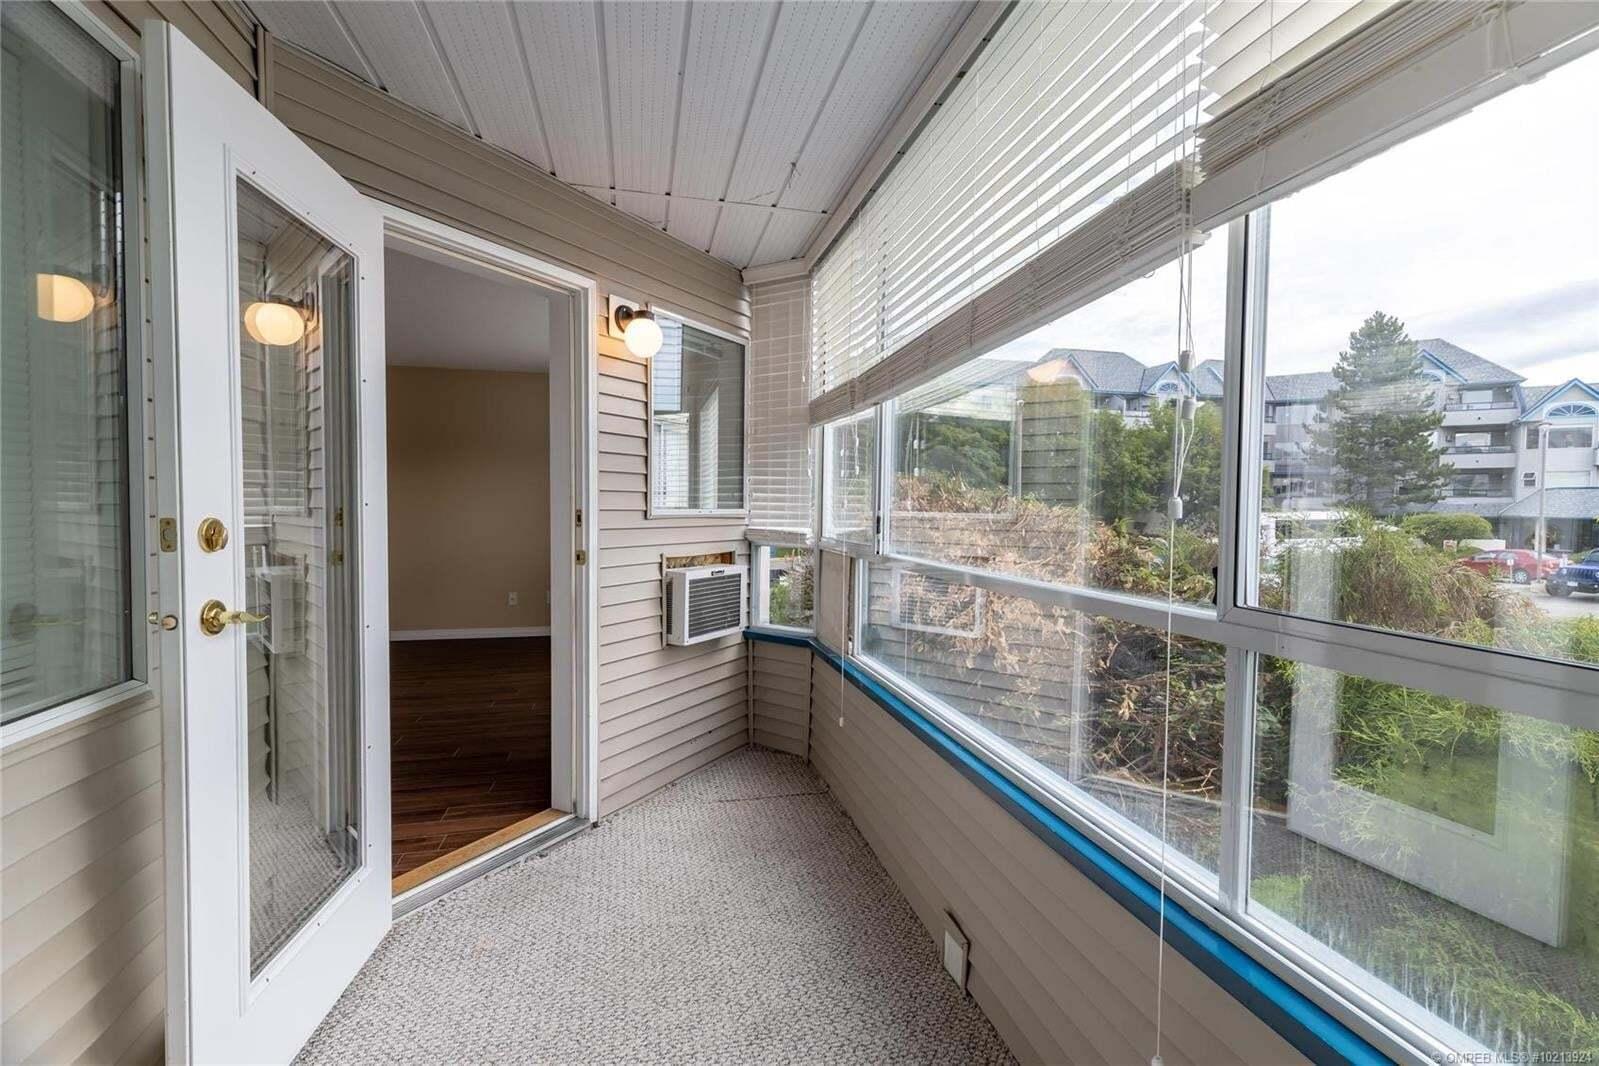 Condo for sale at 3283 Casorso Rd Unit 109 Kelowna British Columbia - MLS: 10213924